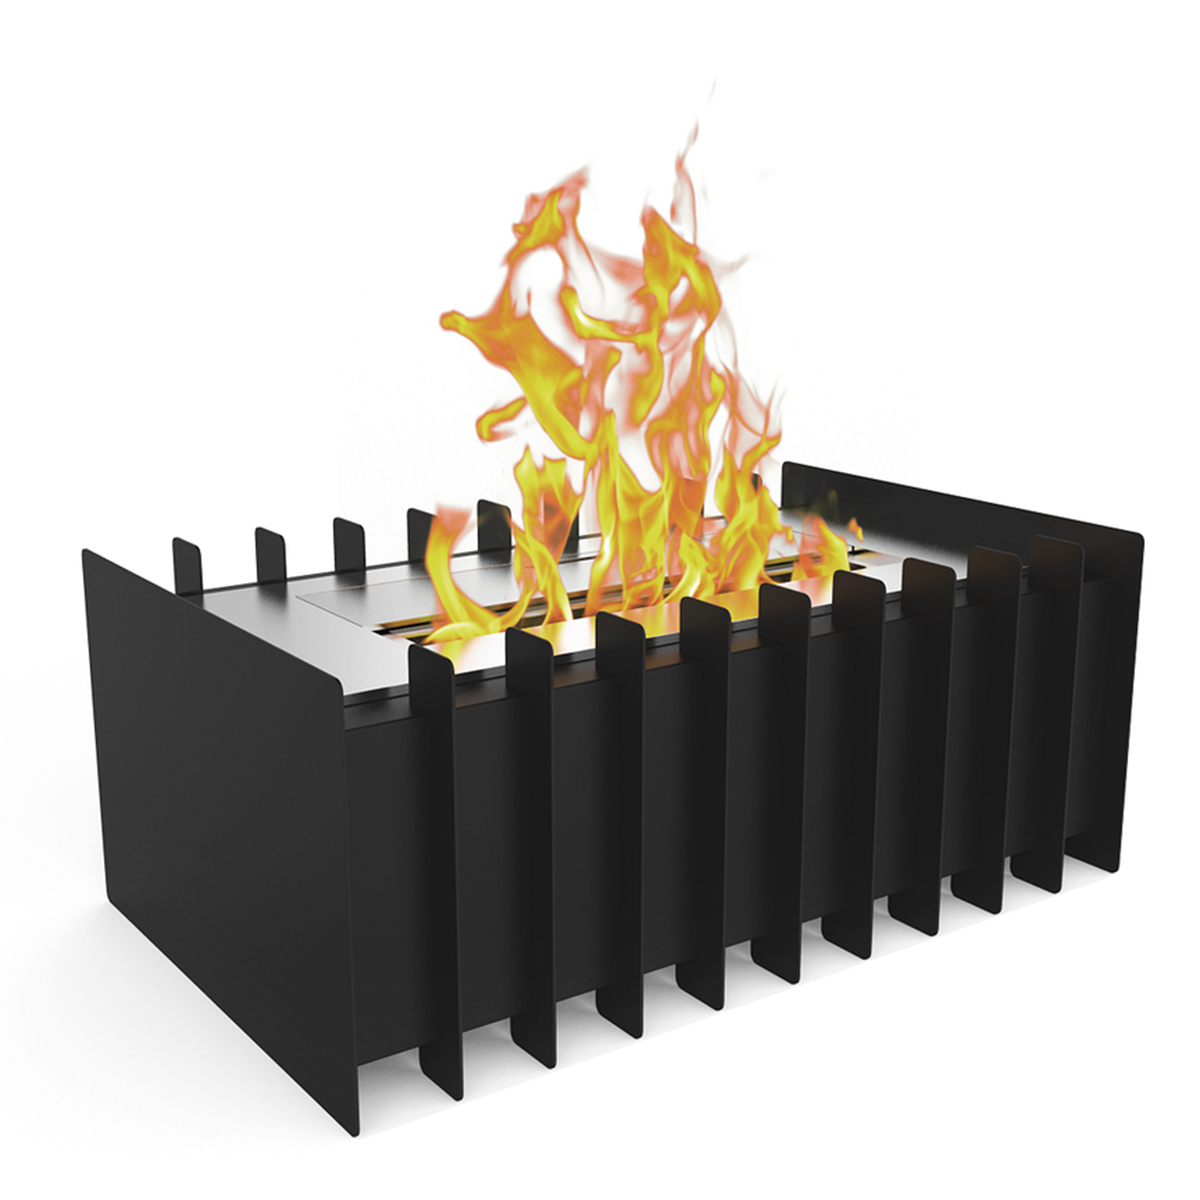 PRO 12 Inch Ventless Bio Ethanol Fireplace Grate Burner Insert   1.5 Liter